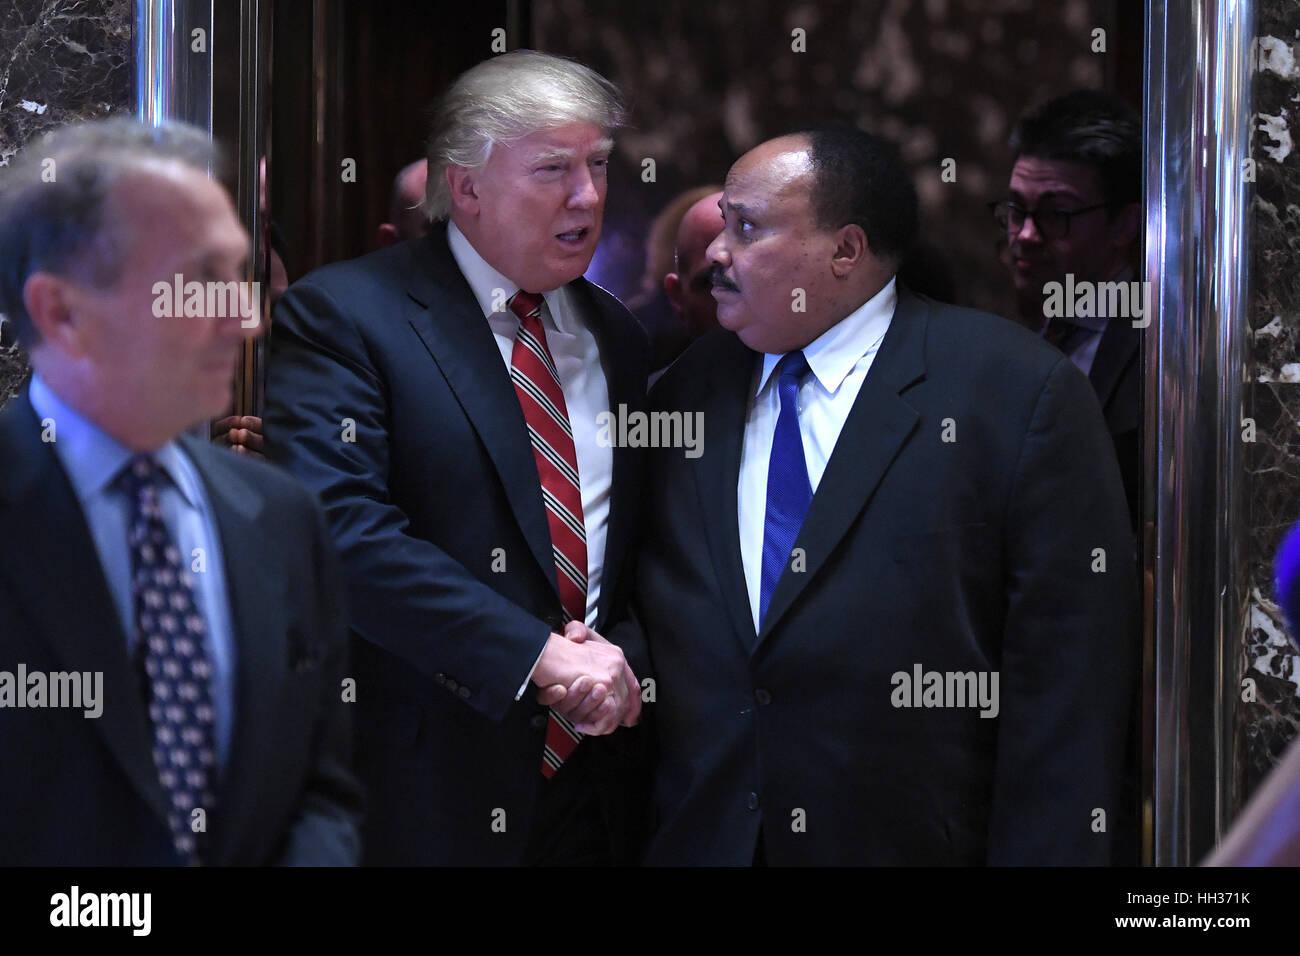 Nueva York, Estados Unidos. 16 ene, 2017. Presidente electo Donald J. Trump agita las manos con Martin Luther King Foto de stock